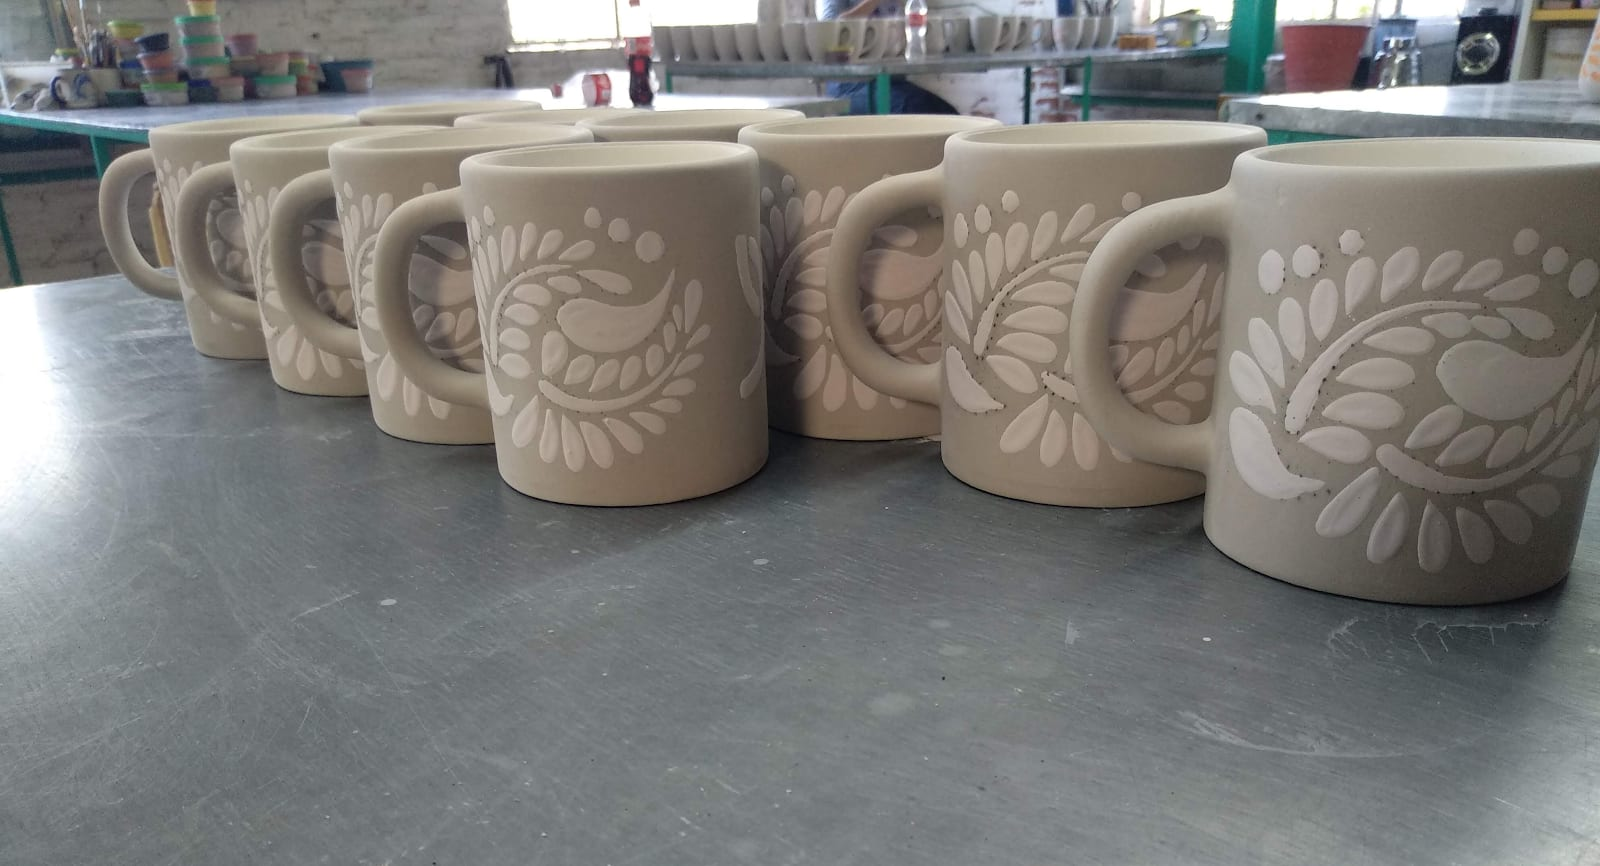 Modus coffee mugs